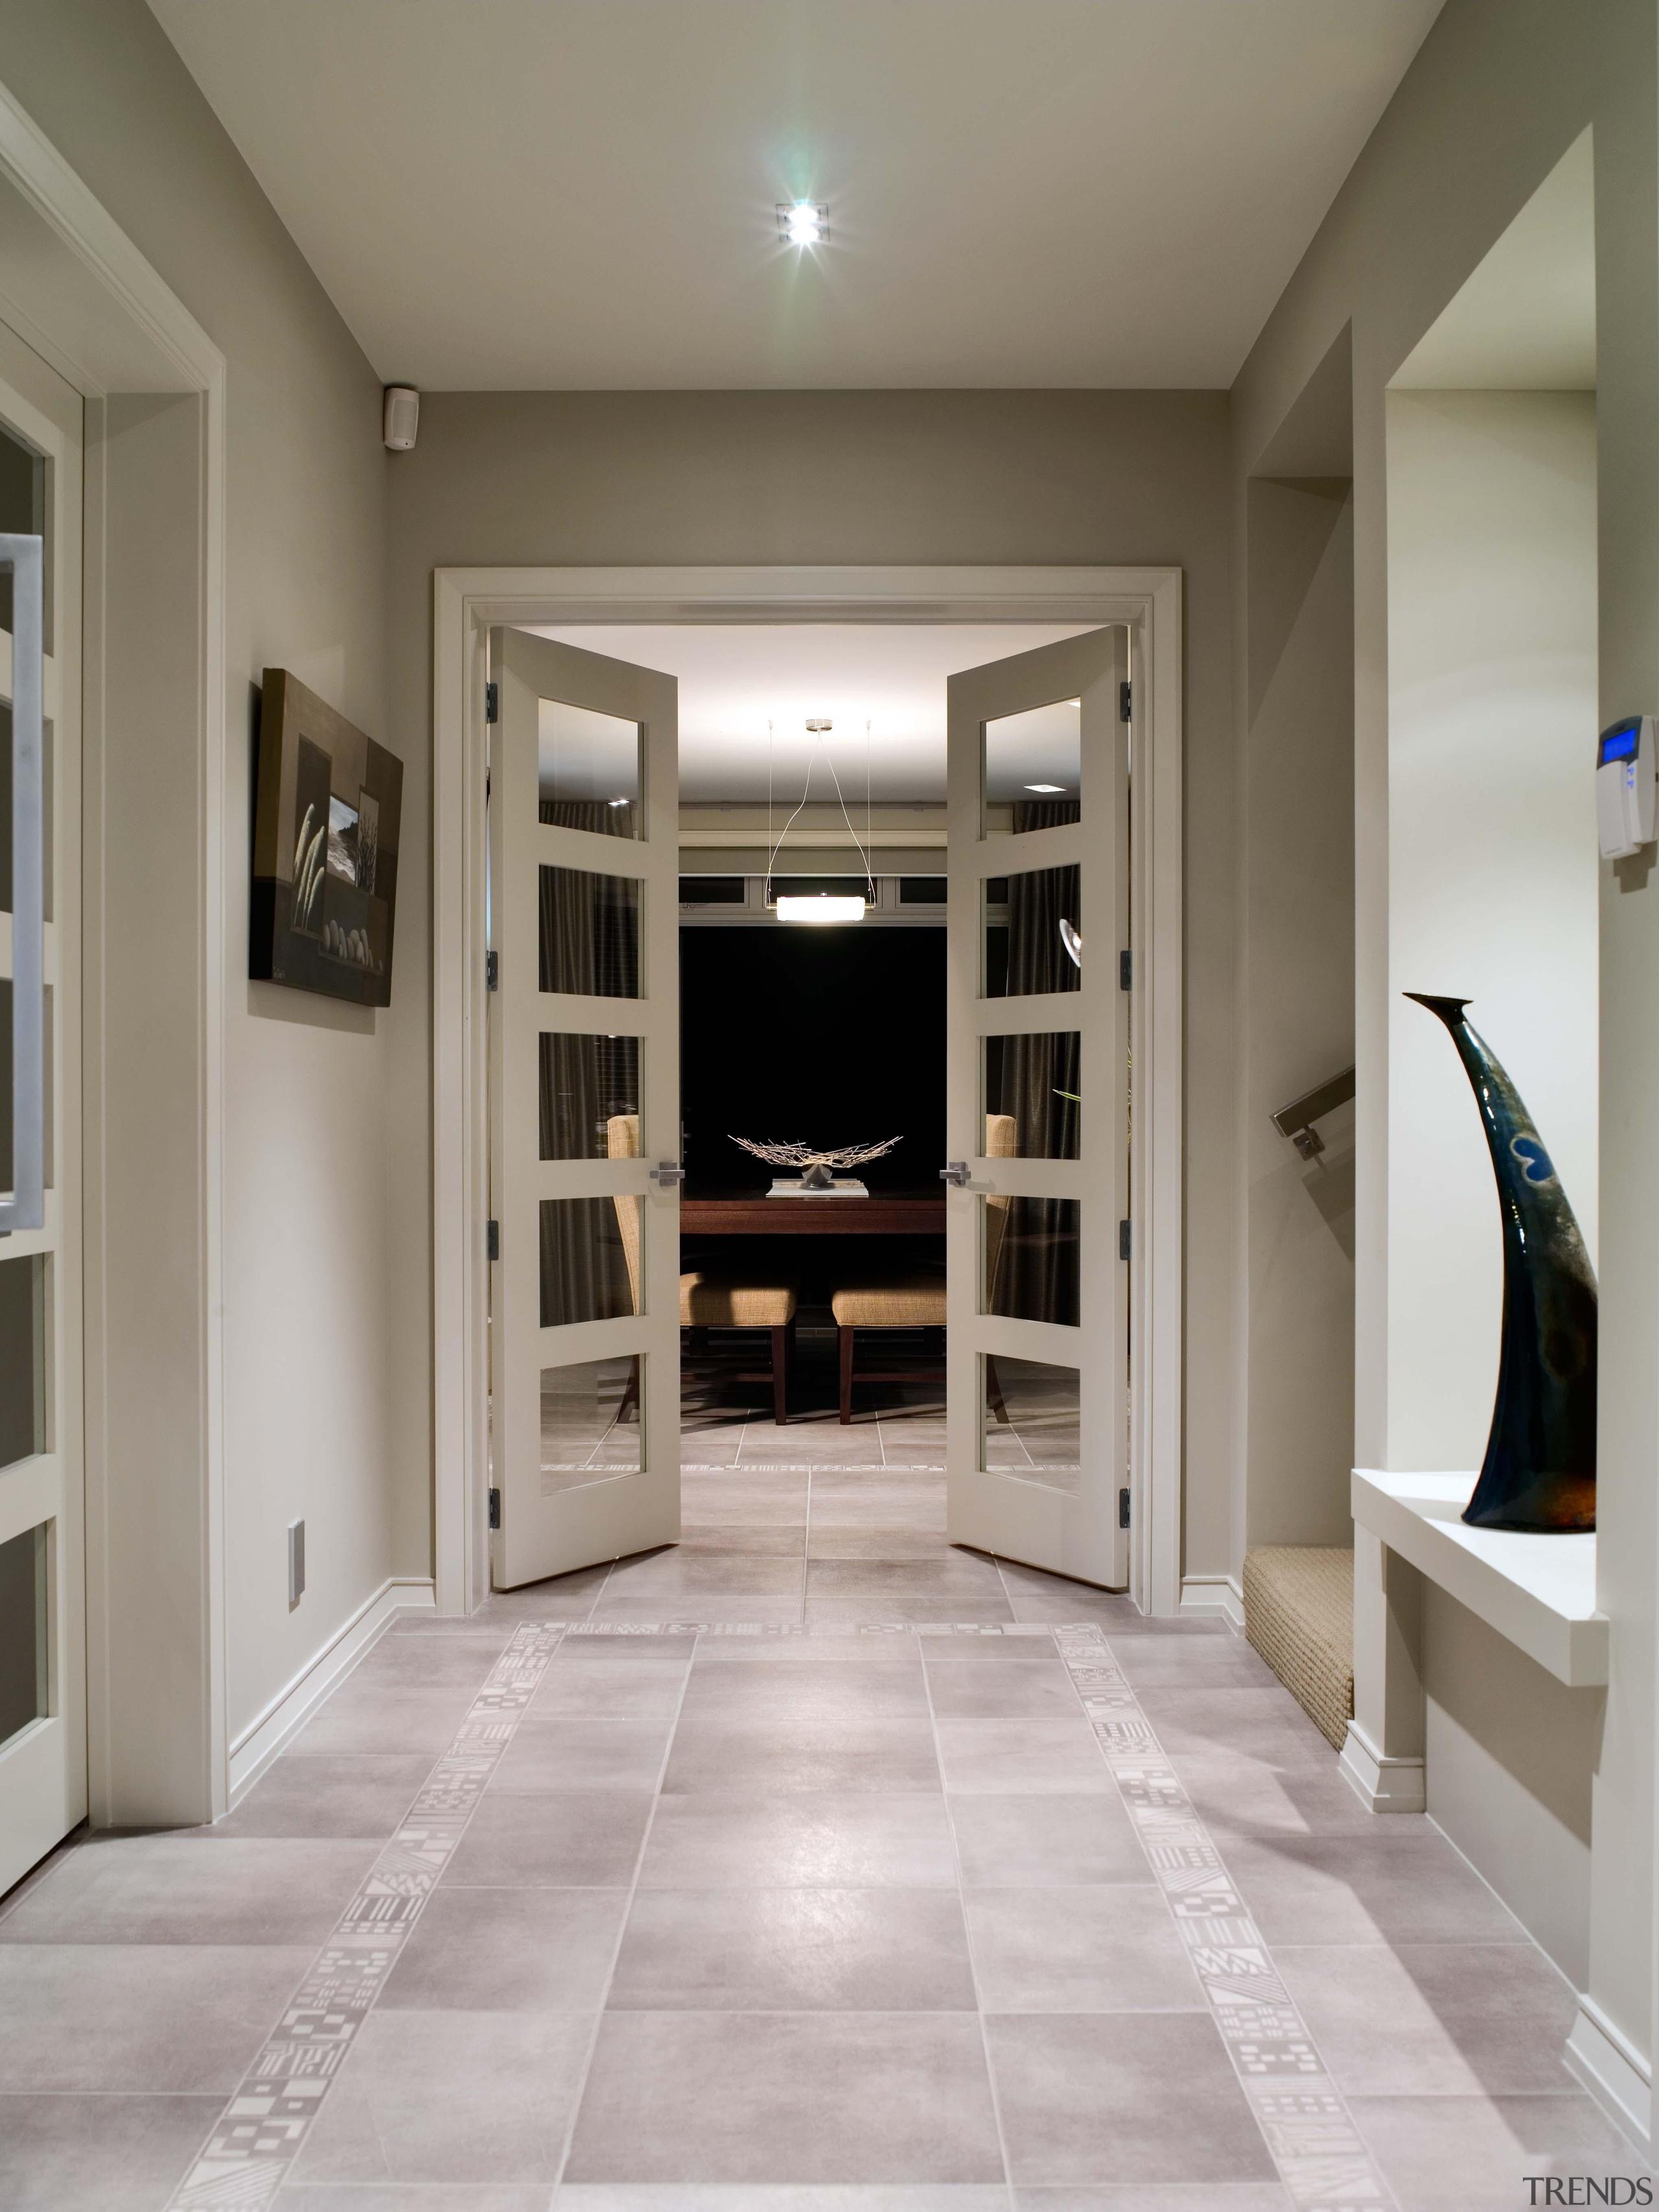 pauanui  entry 1 - pauanui__entry_1 - cabinetry cabinetry, ceiling, floor, flooring, interior design, living room, room, wood flooring, gray